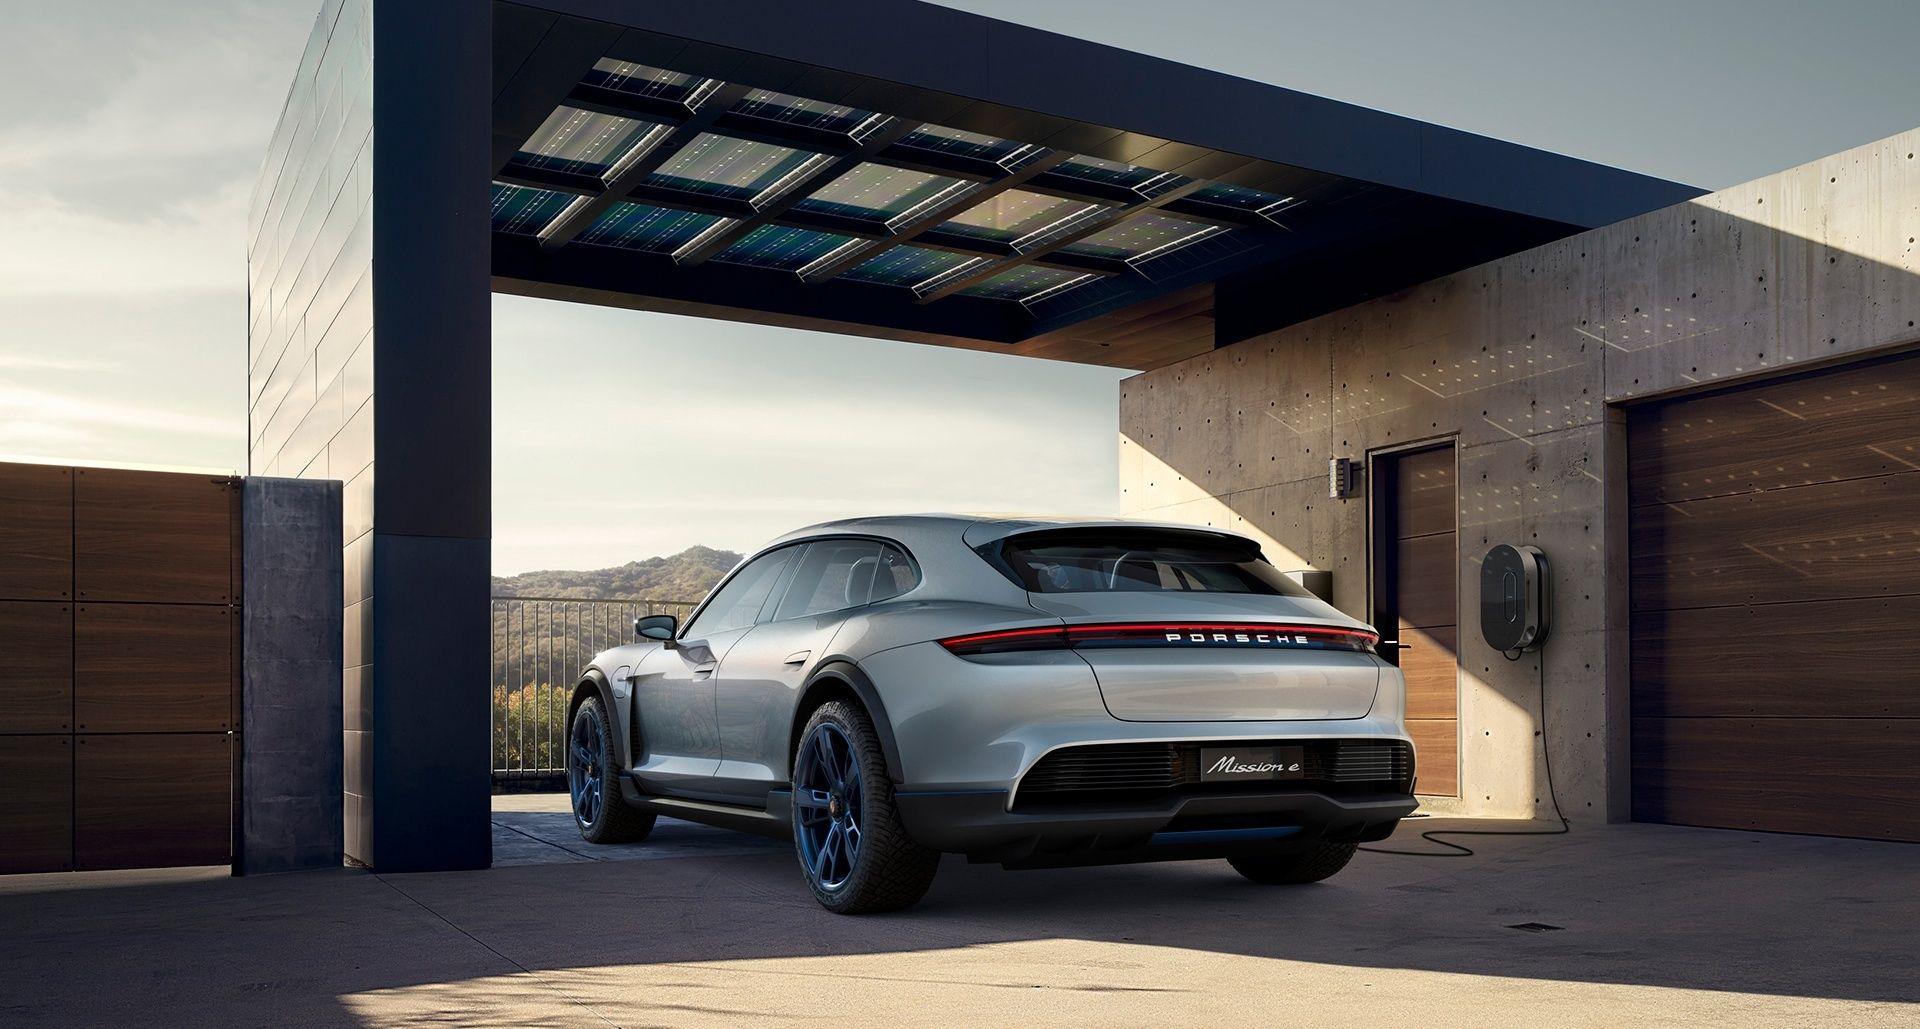 The new Porsche Mission E Cross Turismo will be built in 2019